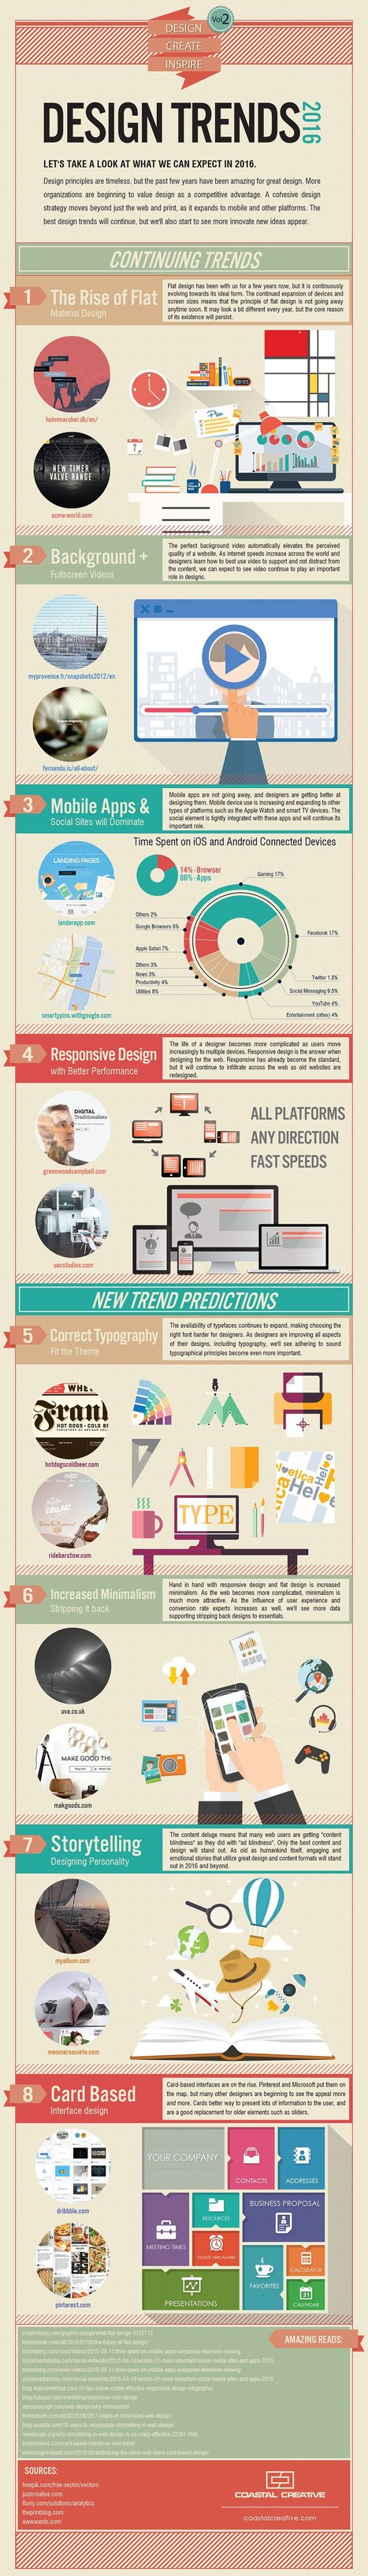 8 Web design trends for 2016 [Infographic] - Smart Insights Digital Marketing Advice | social Media & digital marketing | Scoop.it